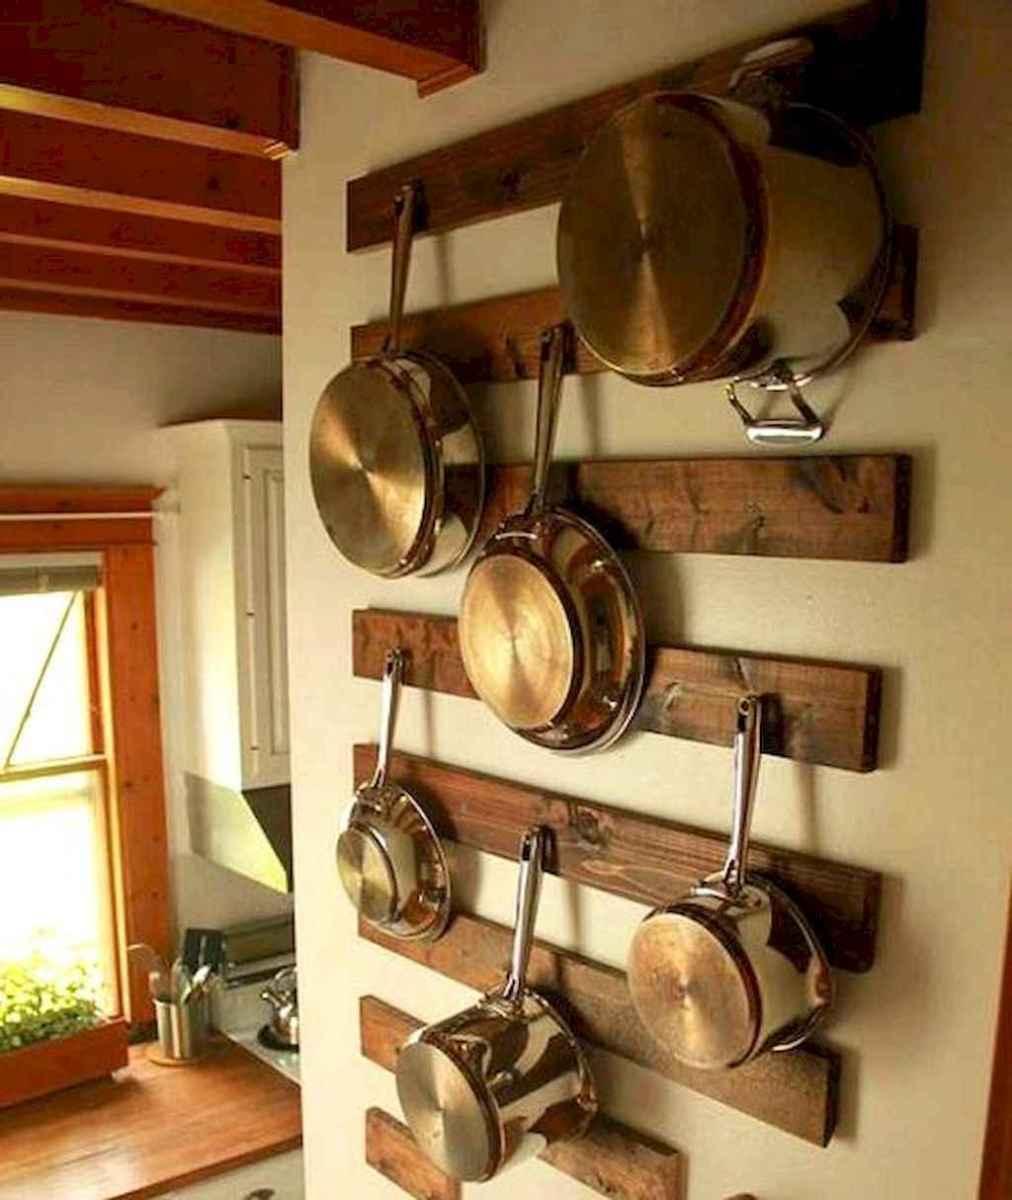 100 Brilliant Kitchen Ideas Organization On A Budget (24)